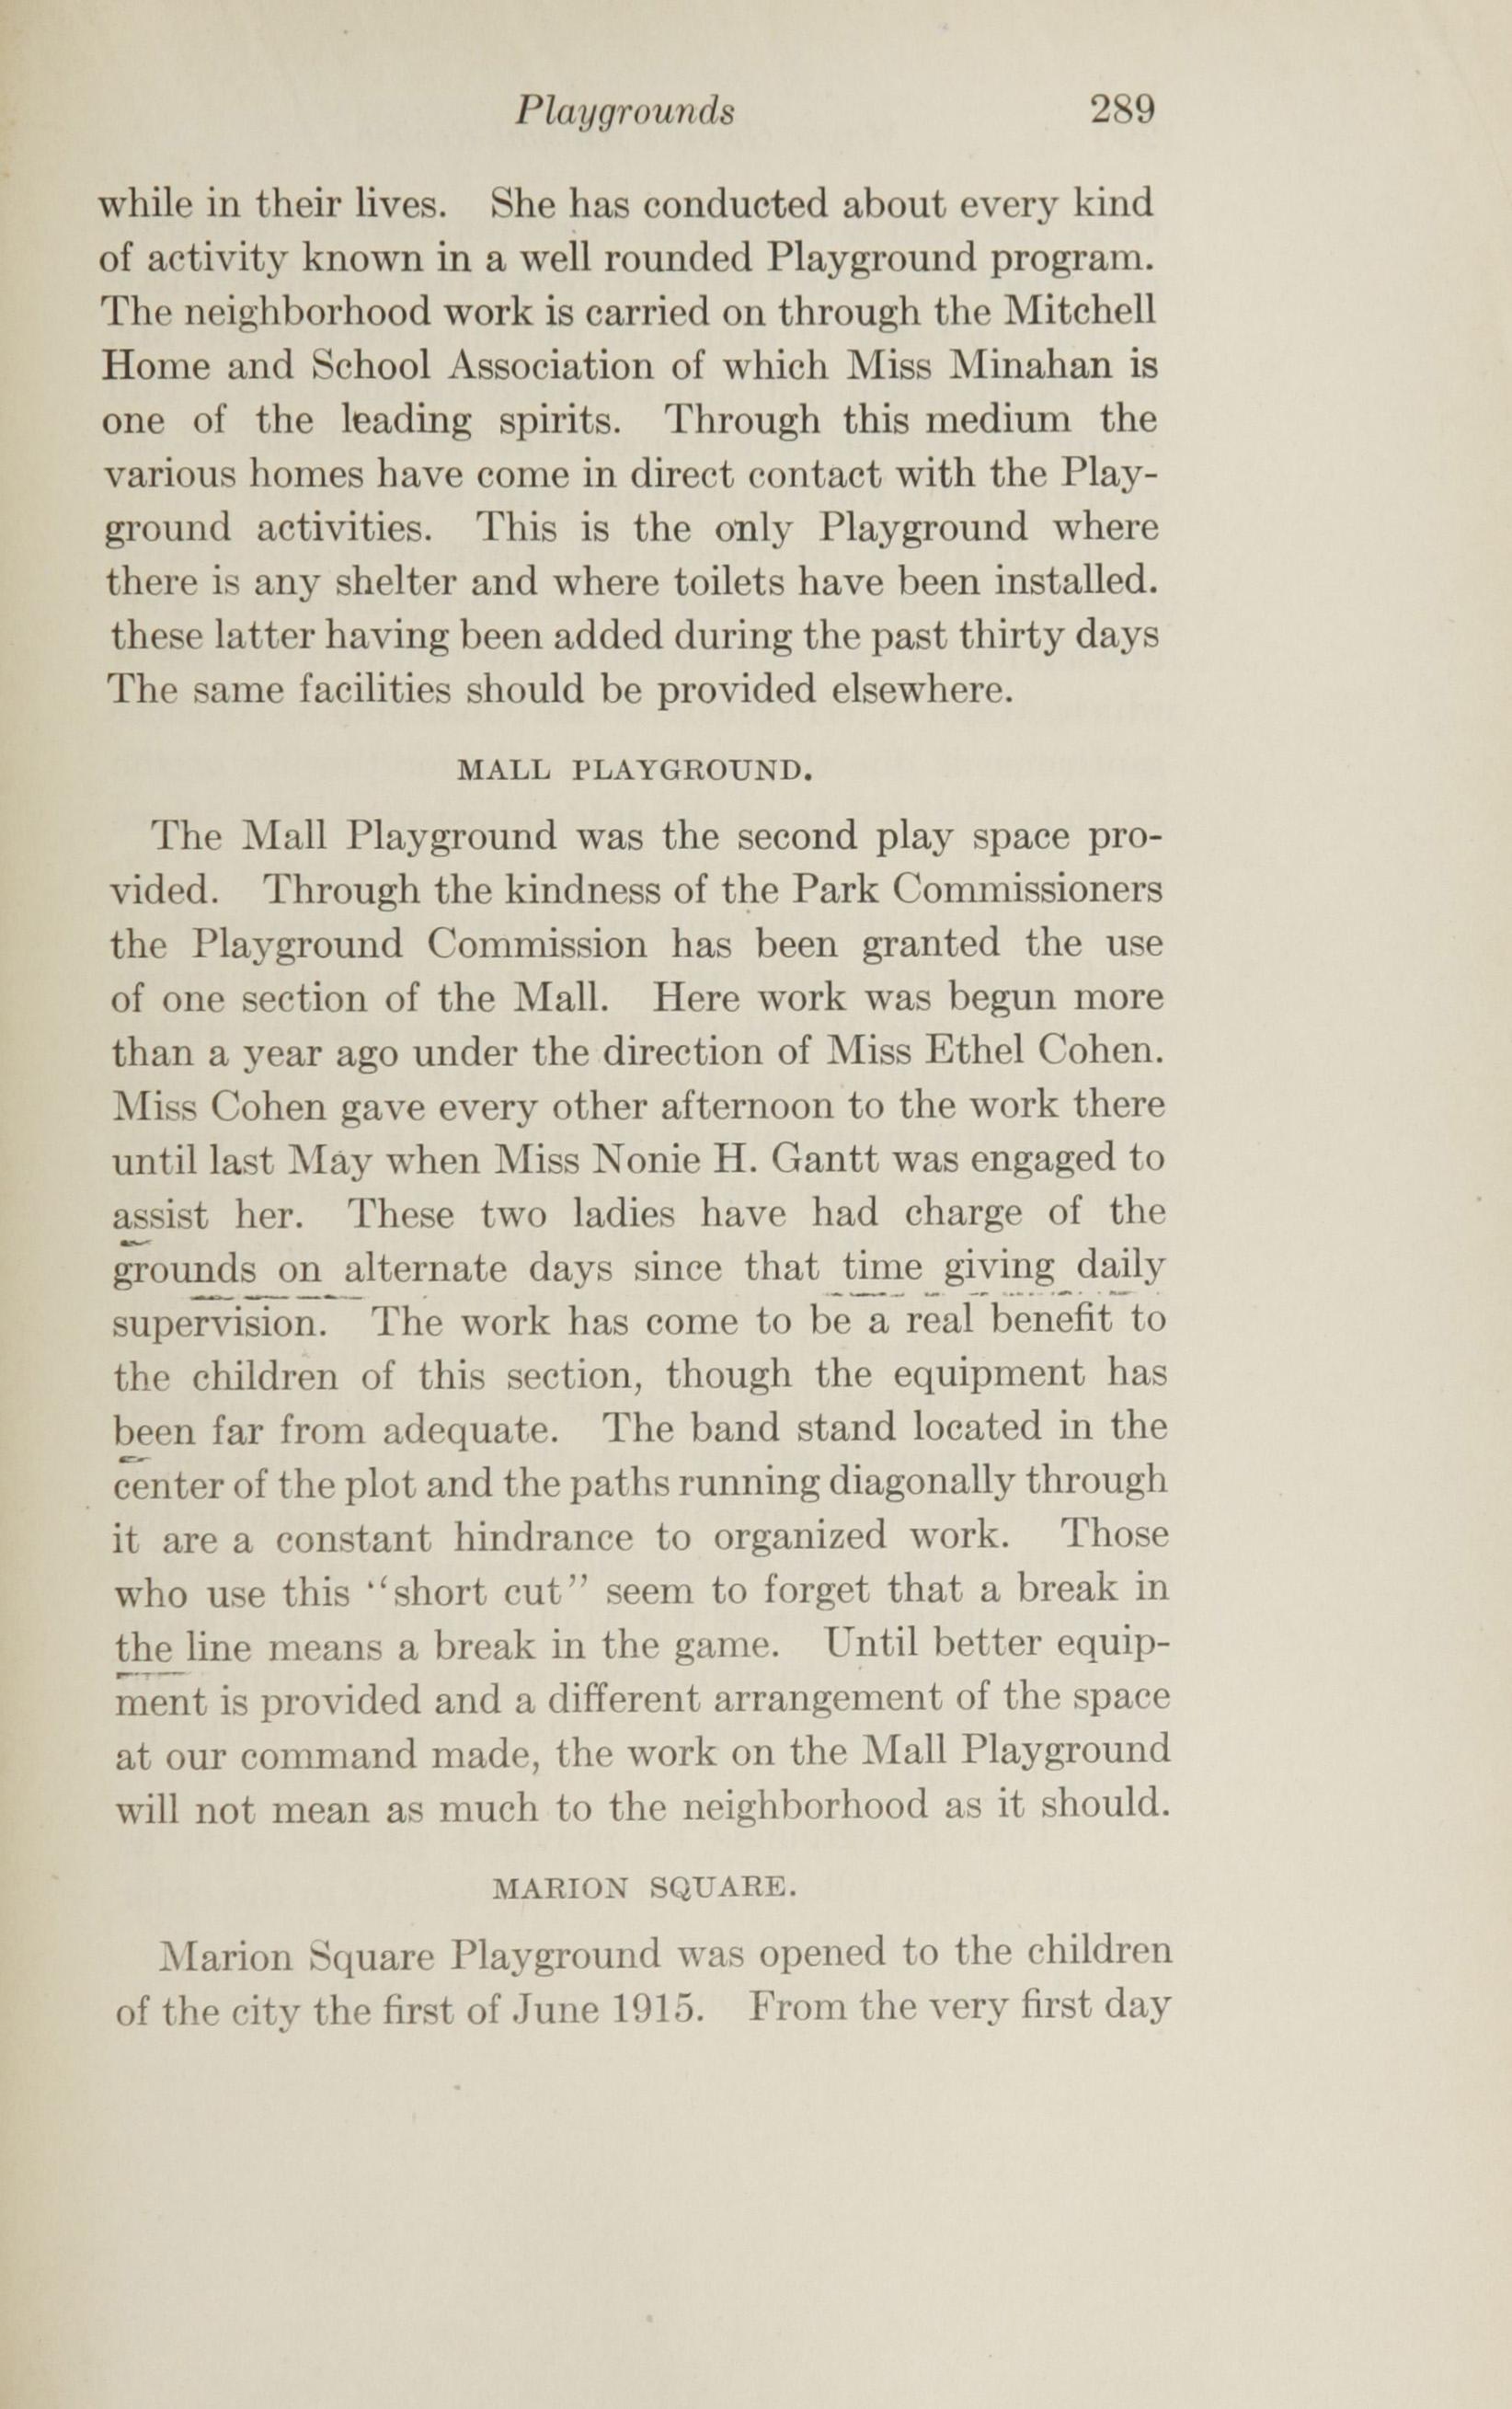 Charleston Yearbook, 1915, page 289